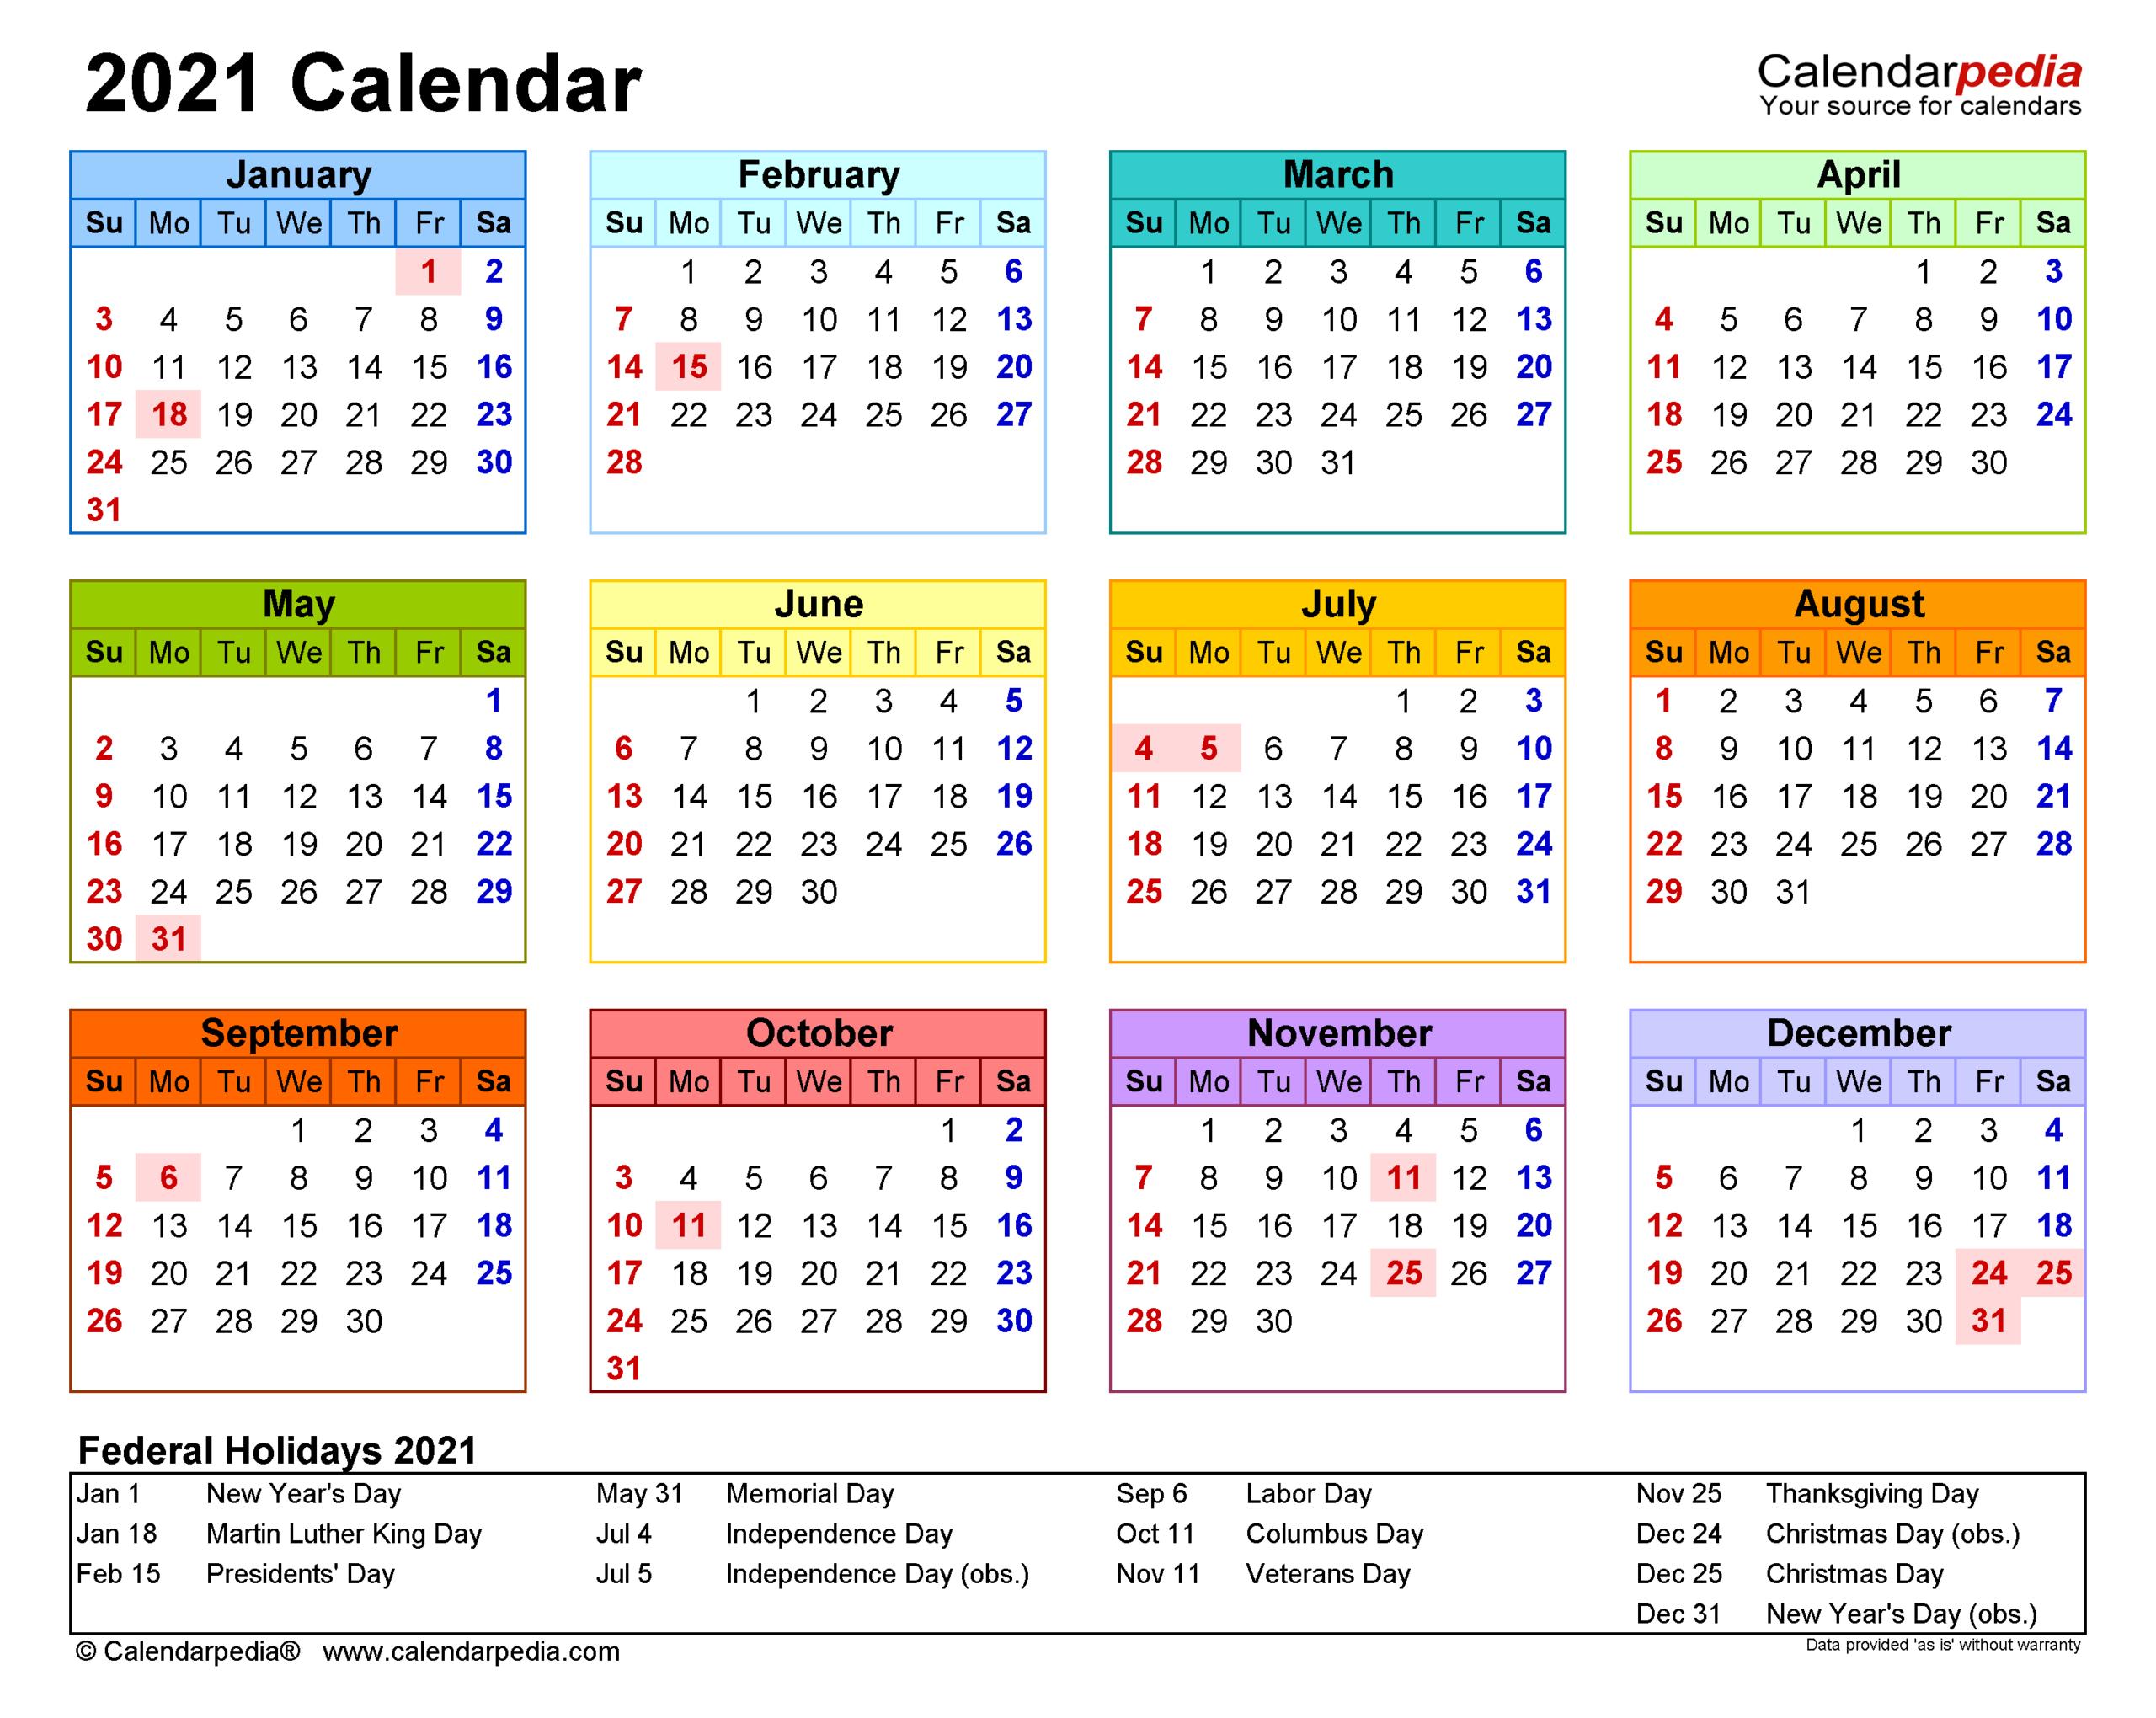 2021 Calendar - Free Printable Word Templates - Calendarpedia for 2021 Pocket Calendar Template